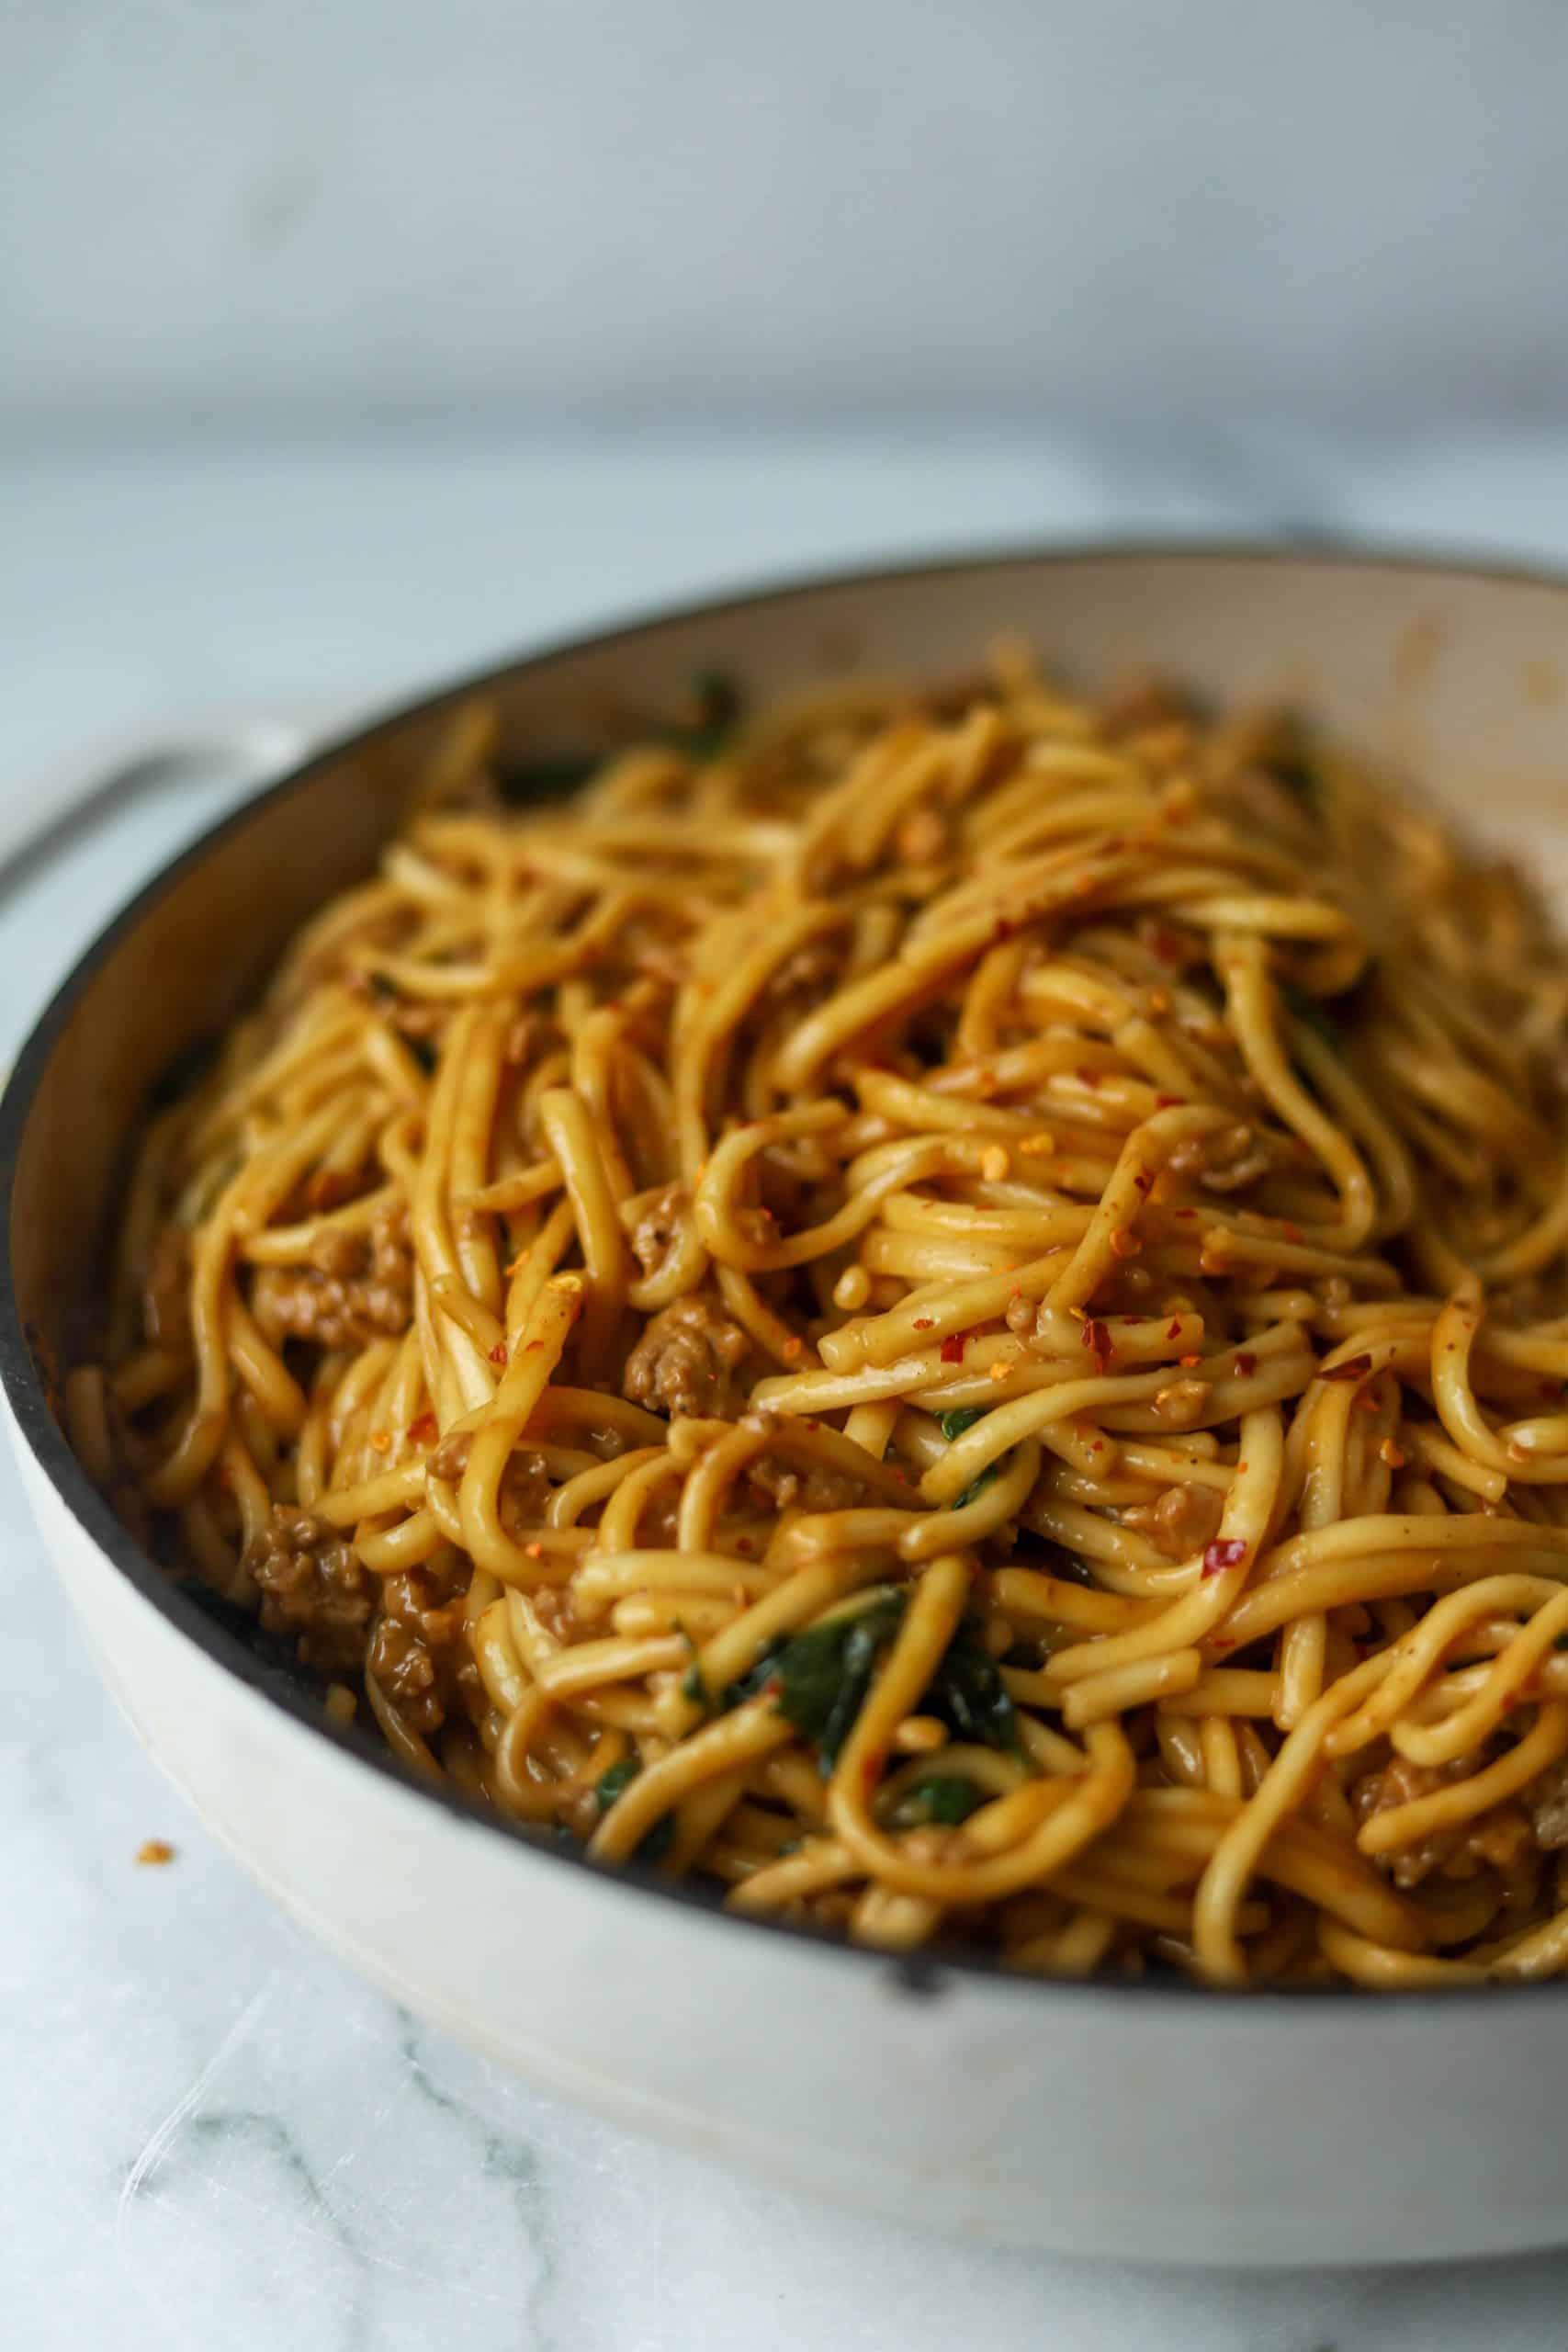 Spicy dan dan noodles in a white dish